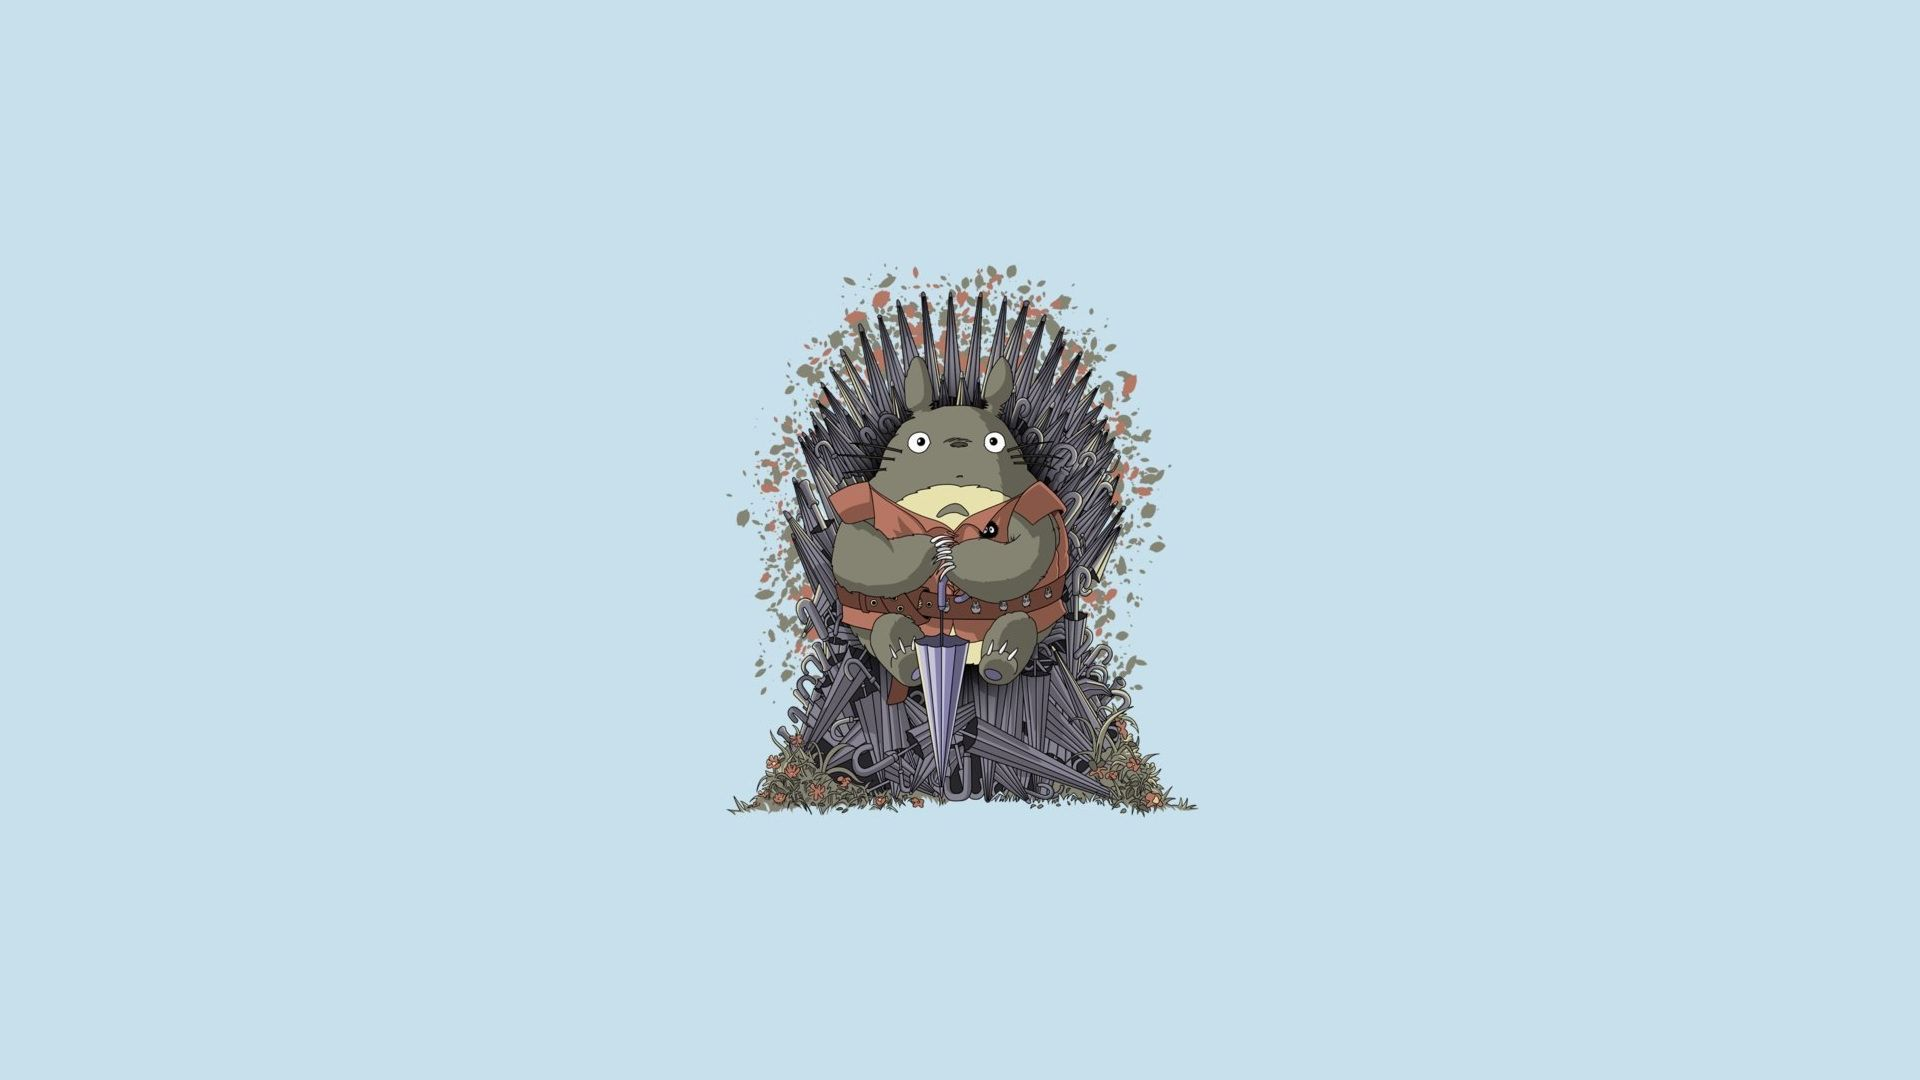 Game of Thrones Totoro Minimalist